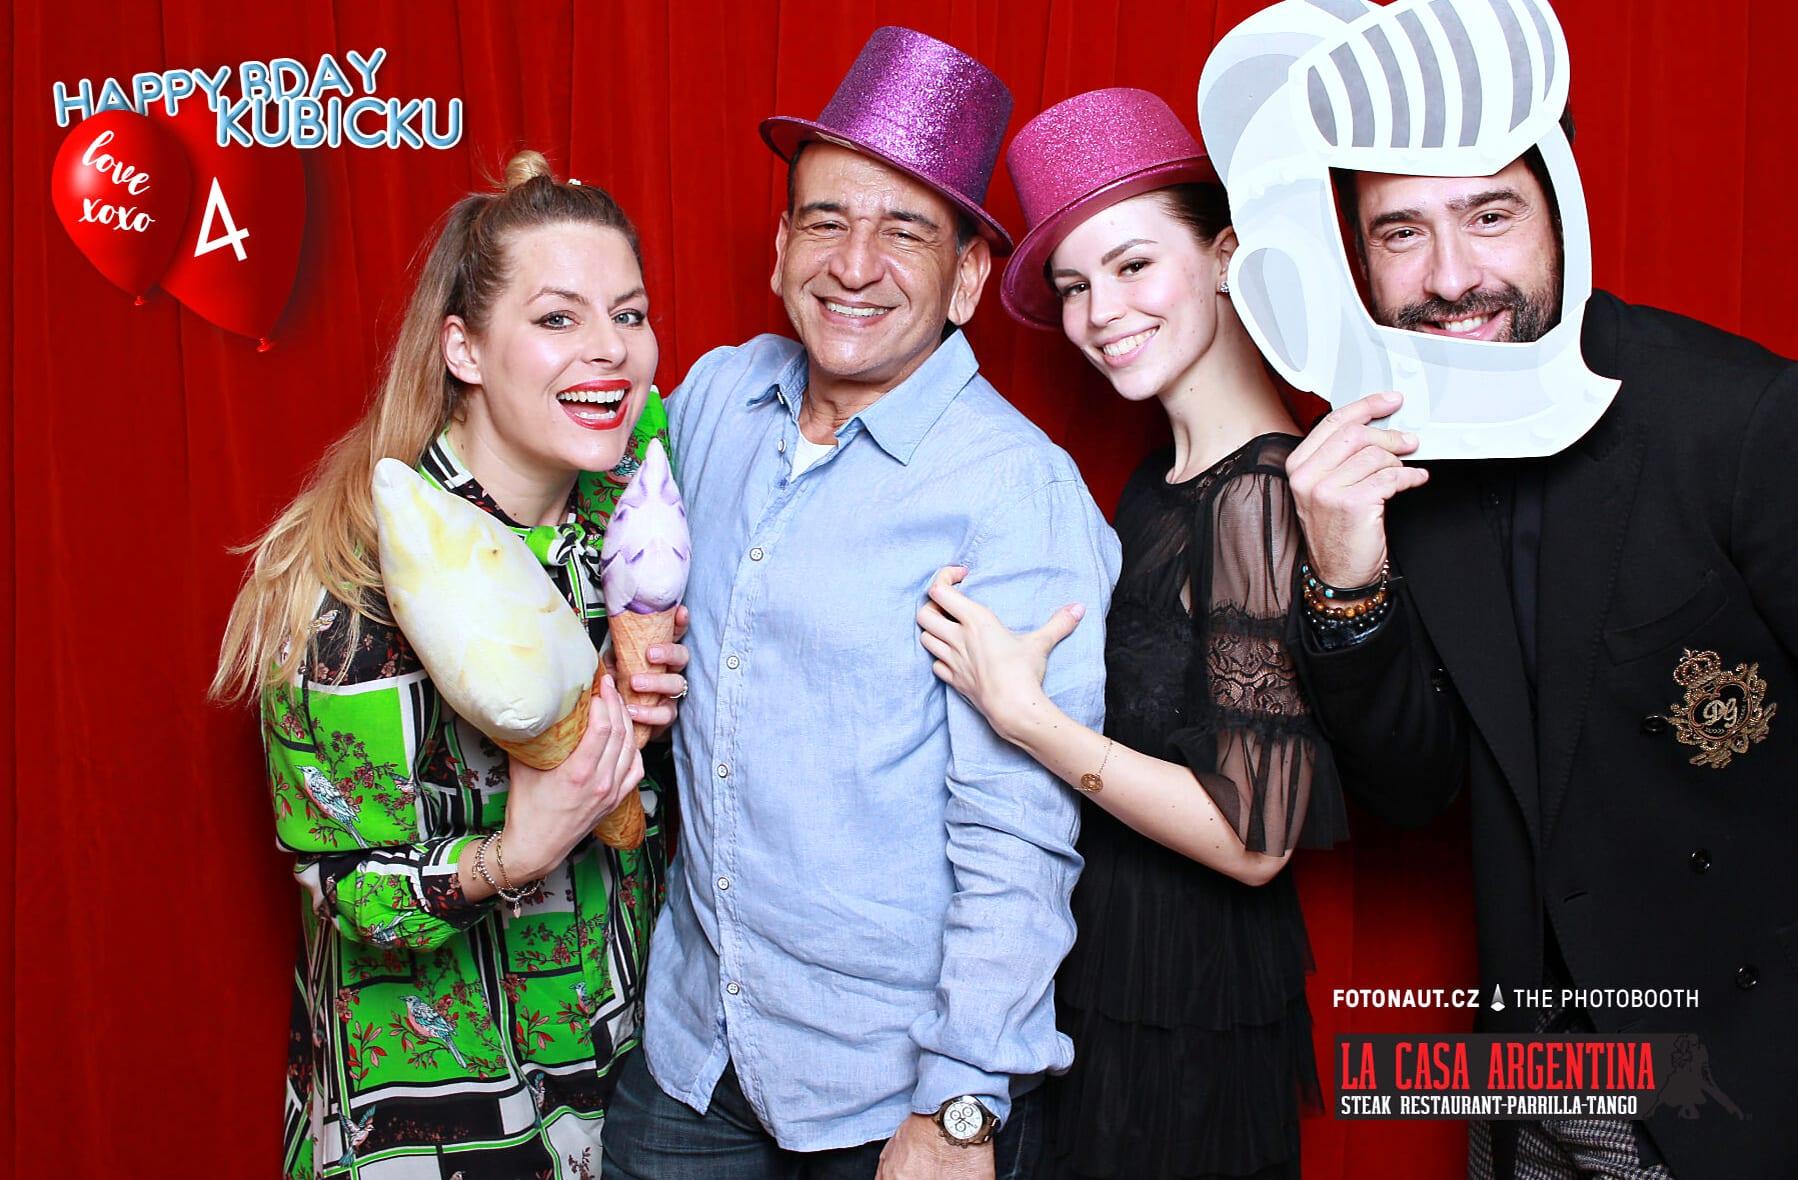 fotokoutek-oslava-praha-la-casa-argentina-7-3-2020-723490